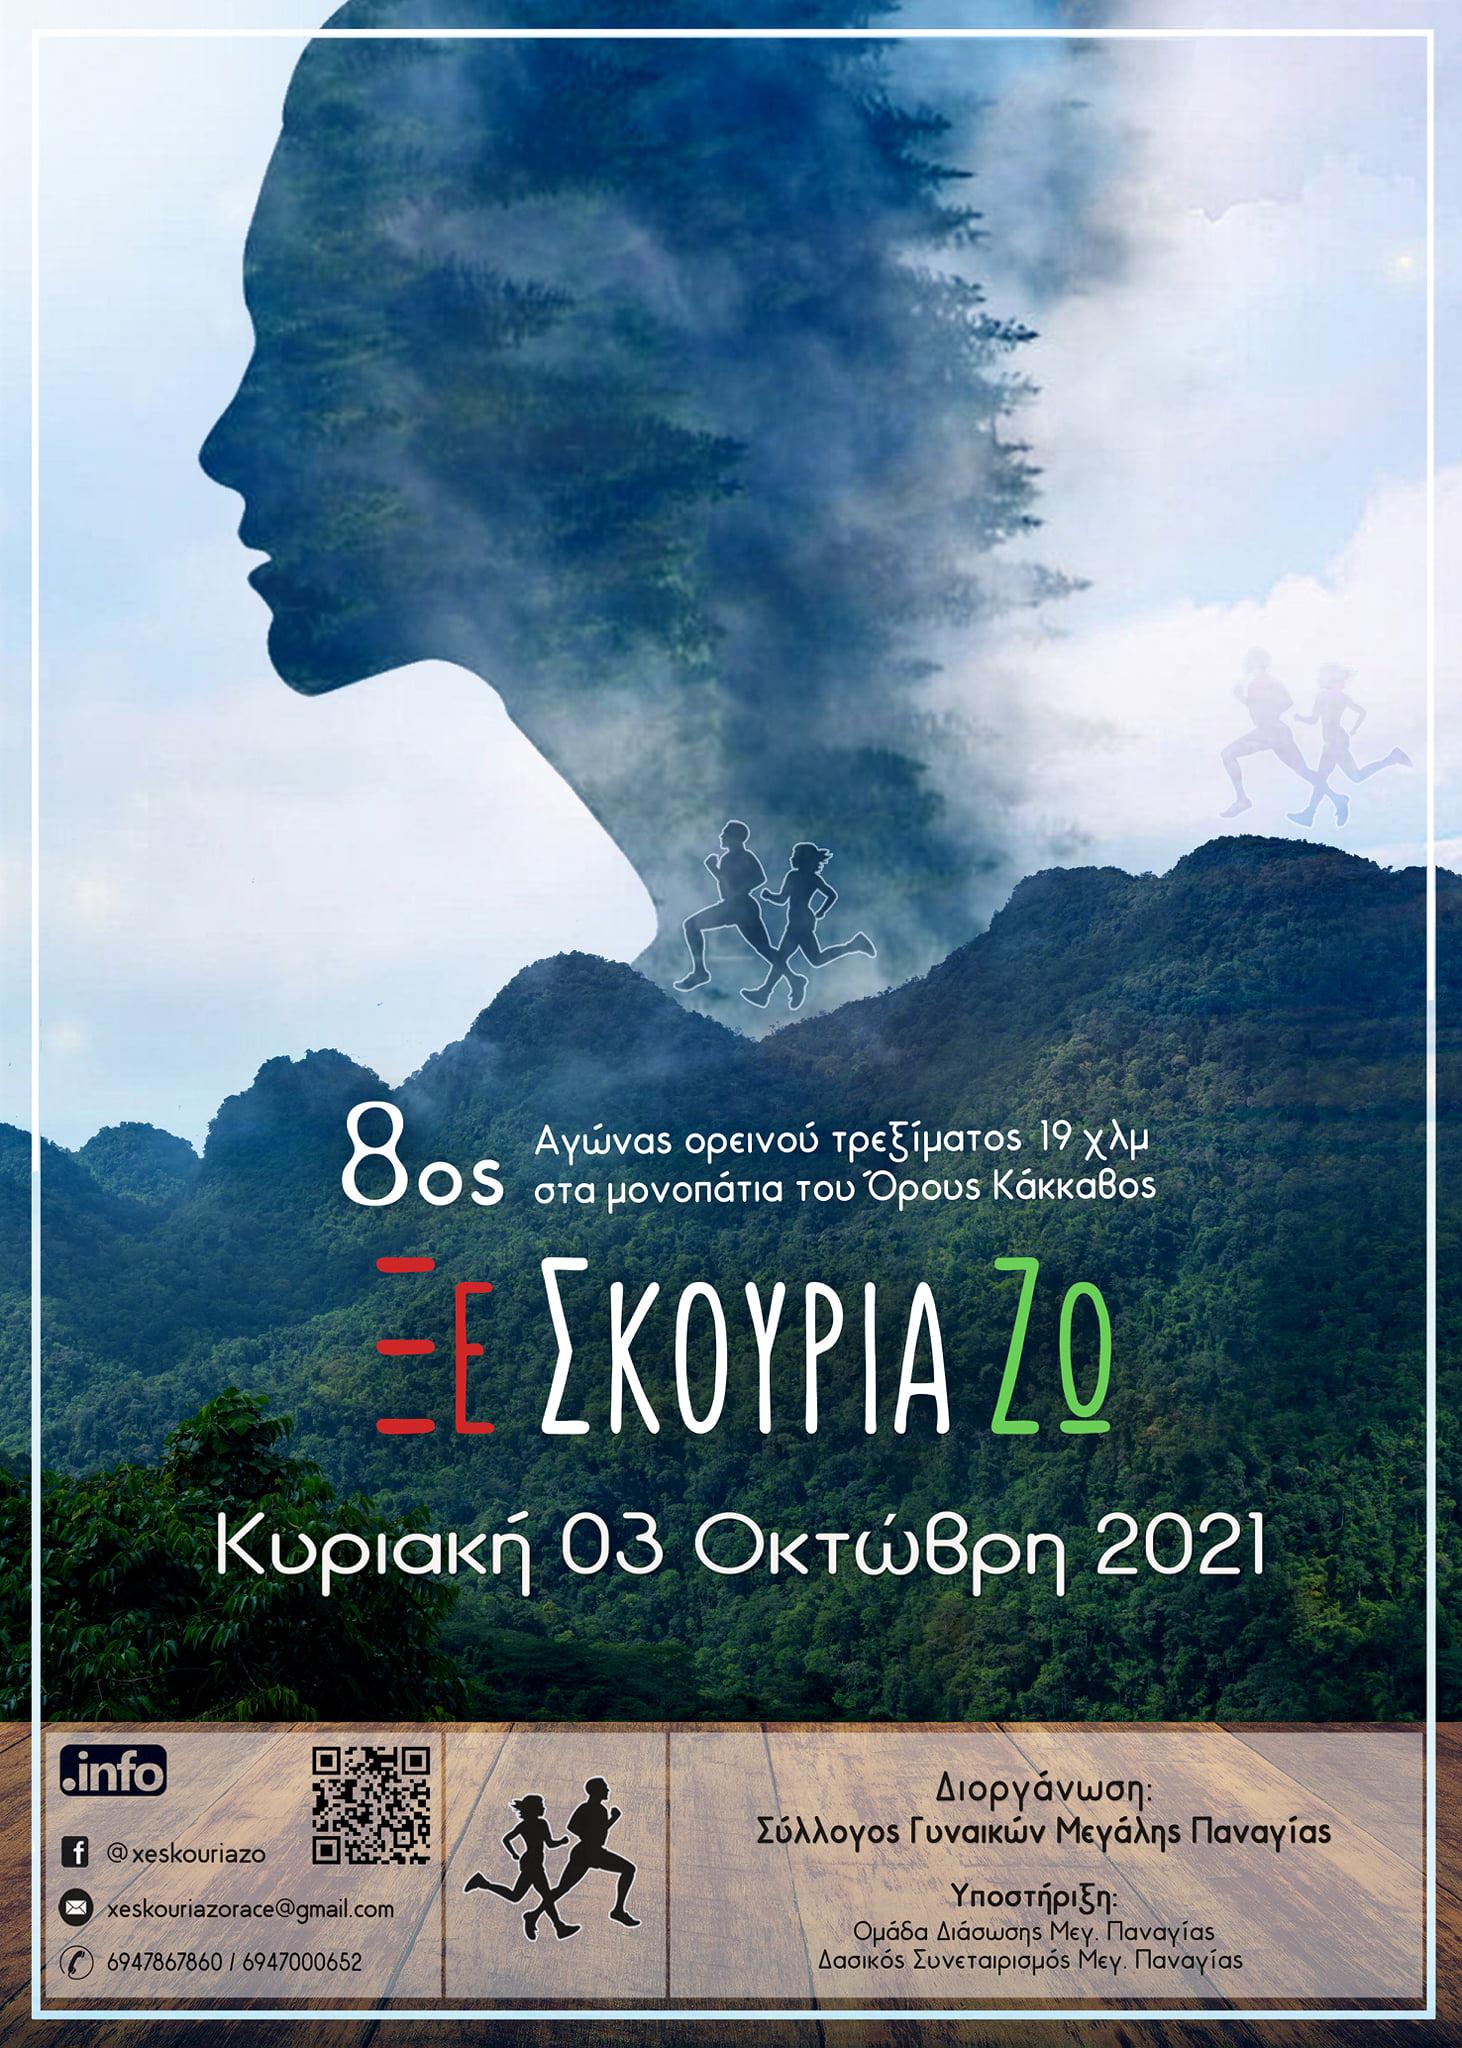 Poster of Megali Panagia Run